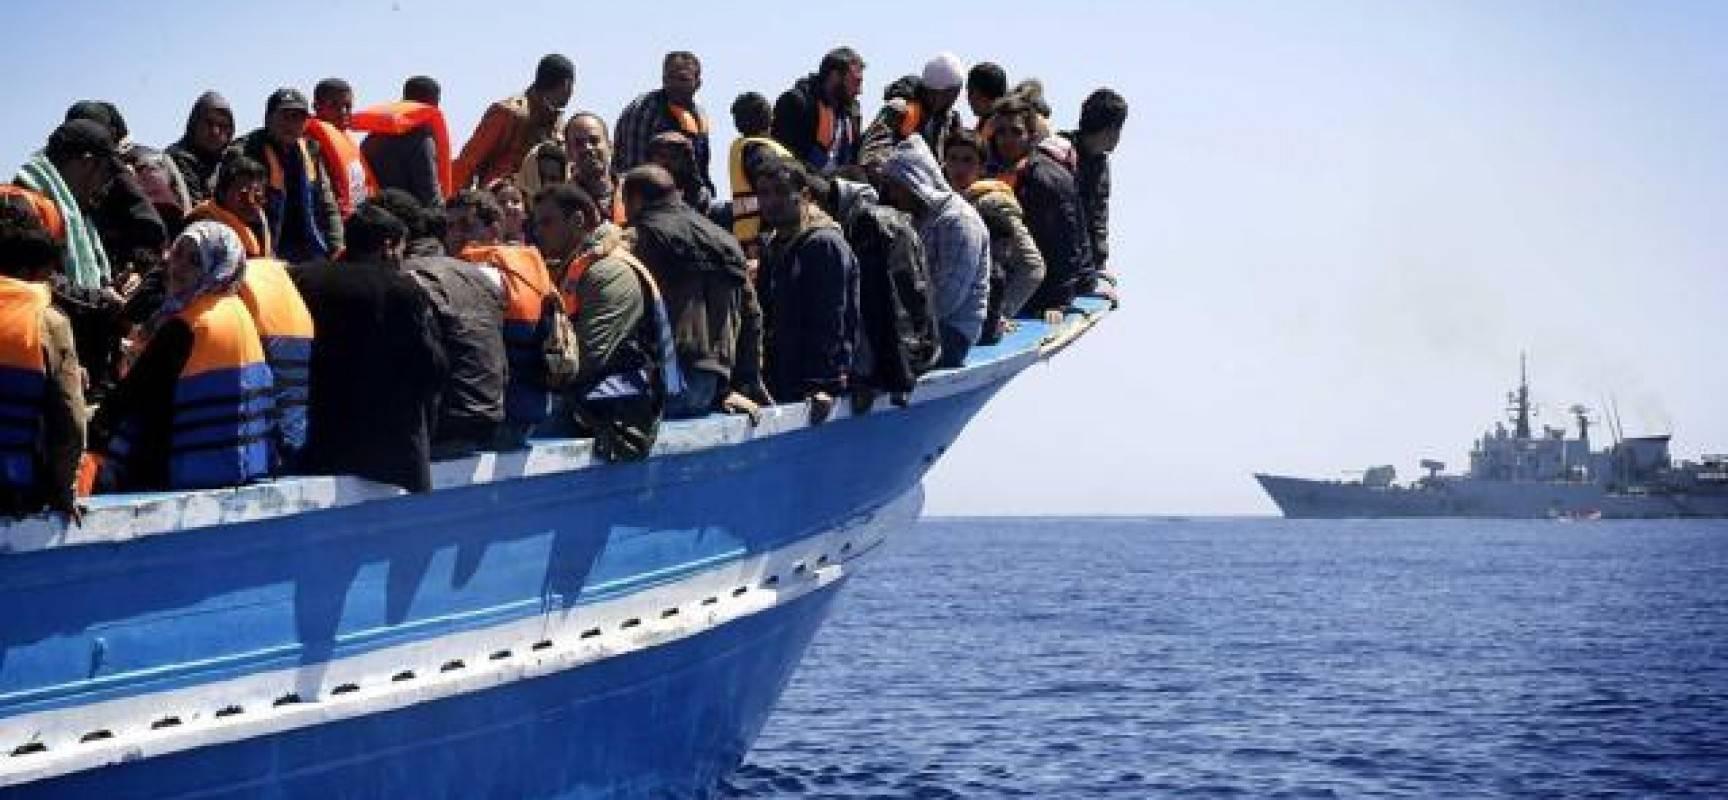 20160513125846-2015042271448-migranti-6500